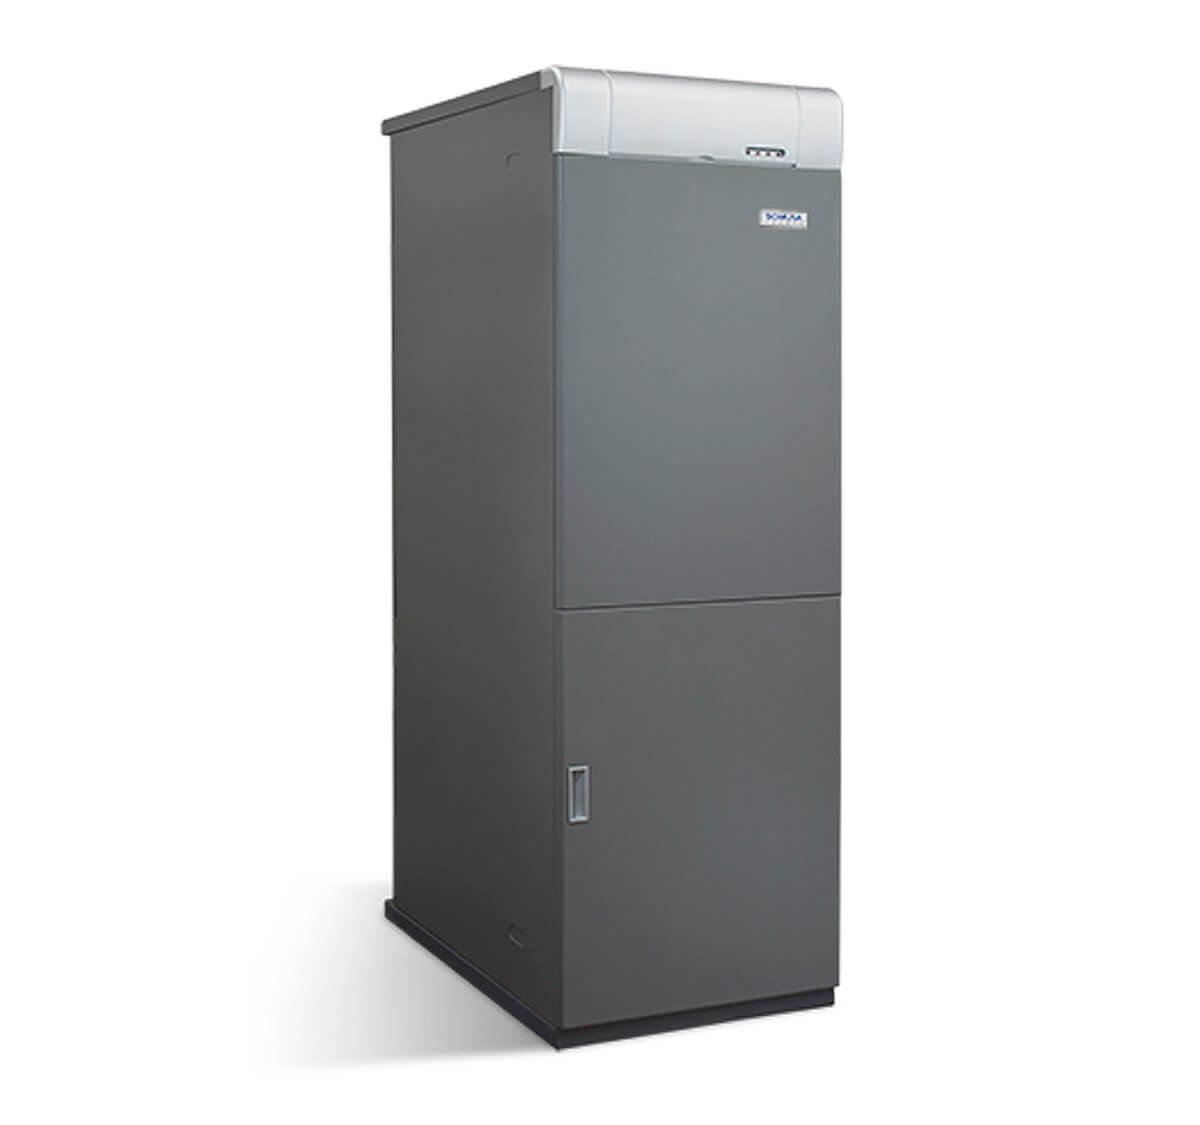 Caldera de Gasoil Domusa MCF 30 HDX VE 100 LTS caseragua